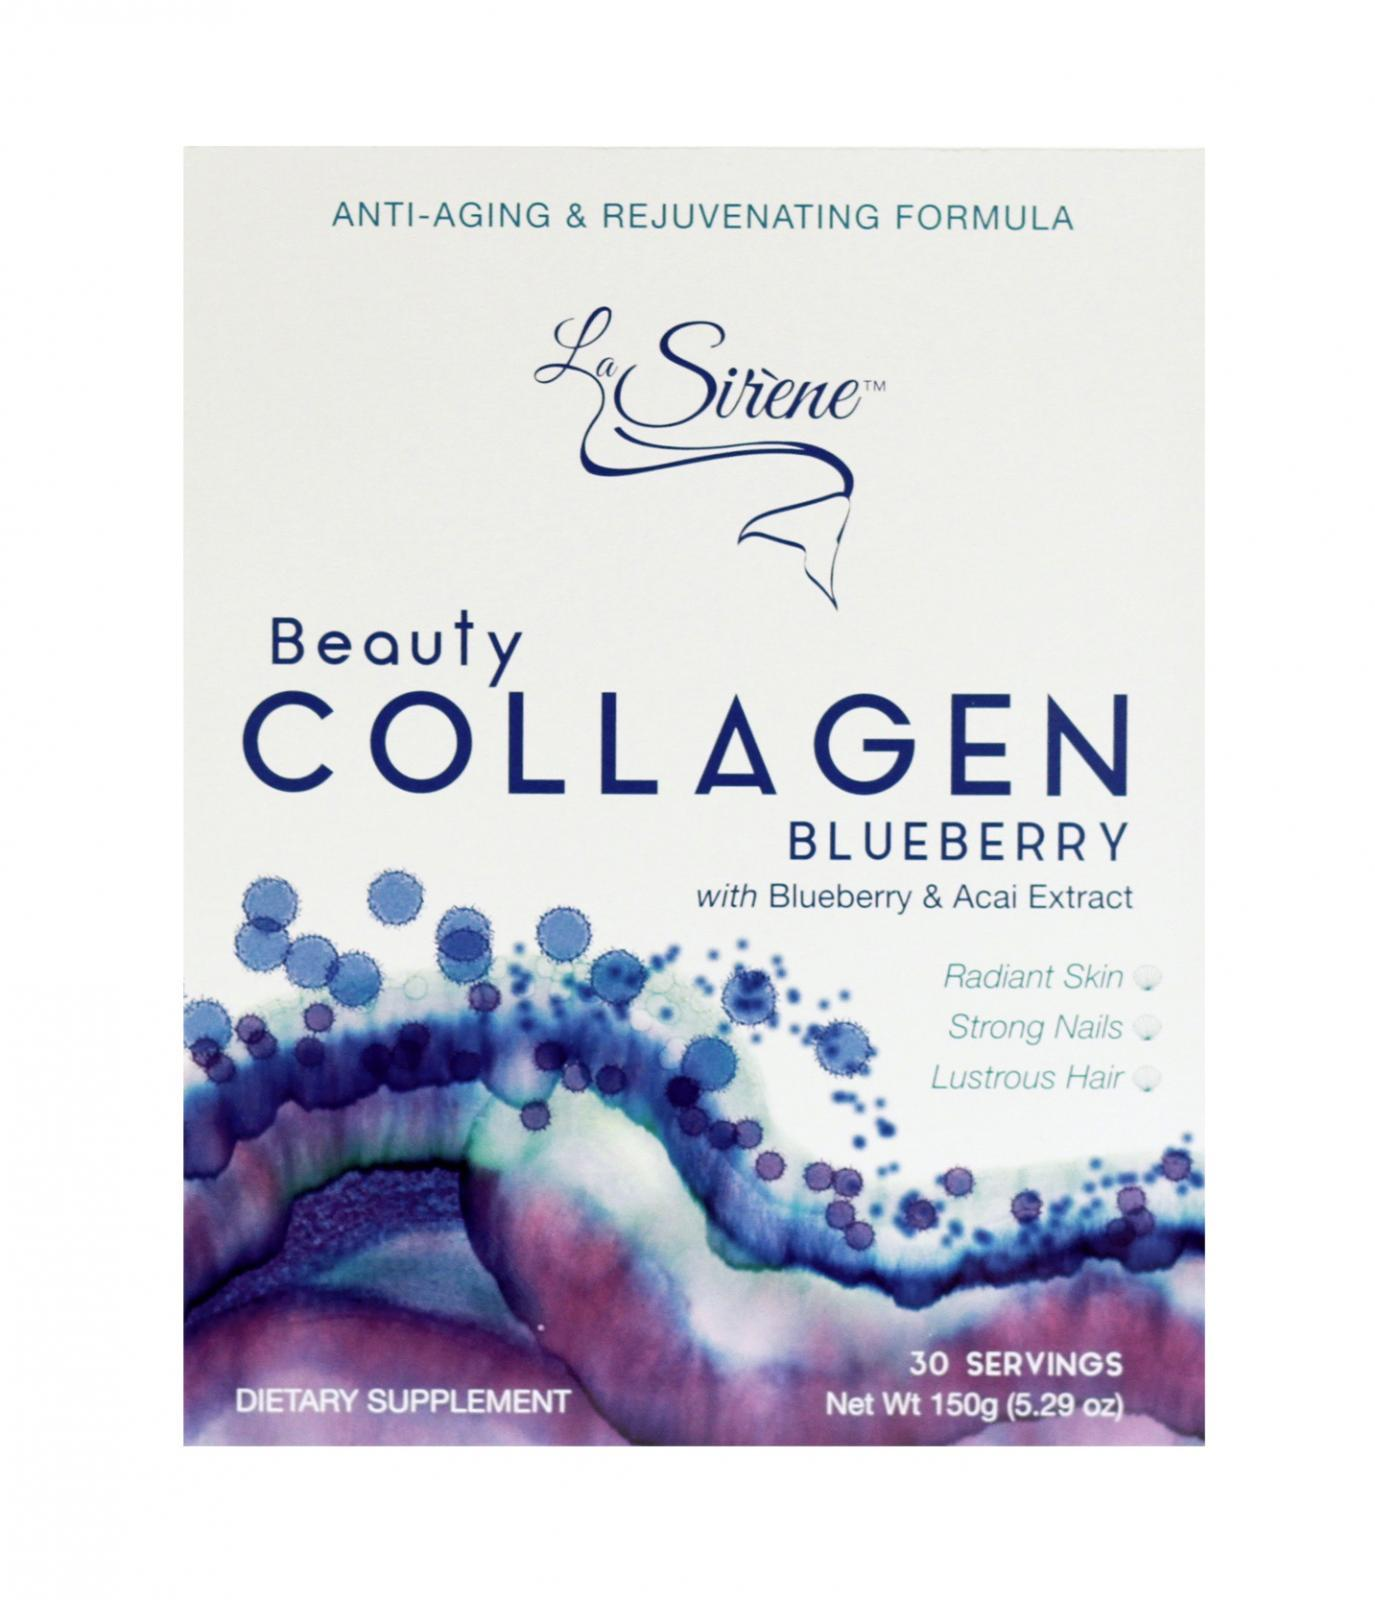 BLUEBERRY Beauty Marine Collagen Supplement